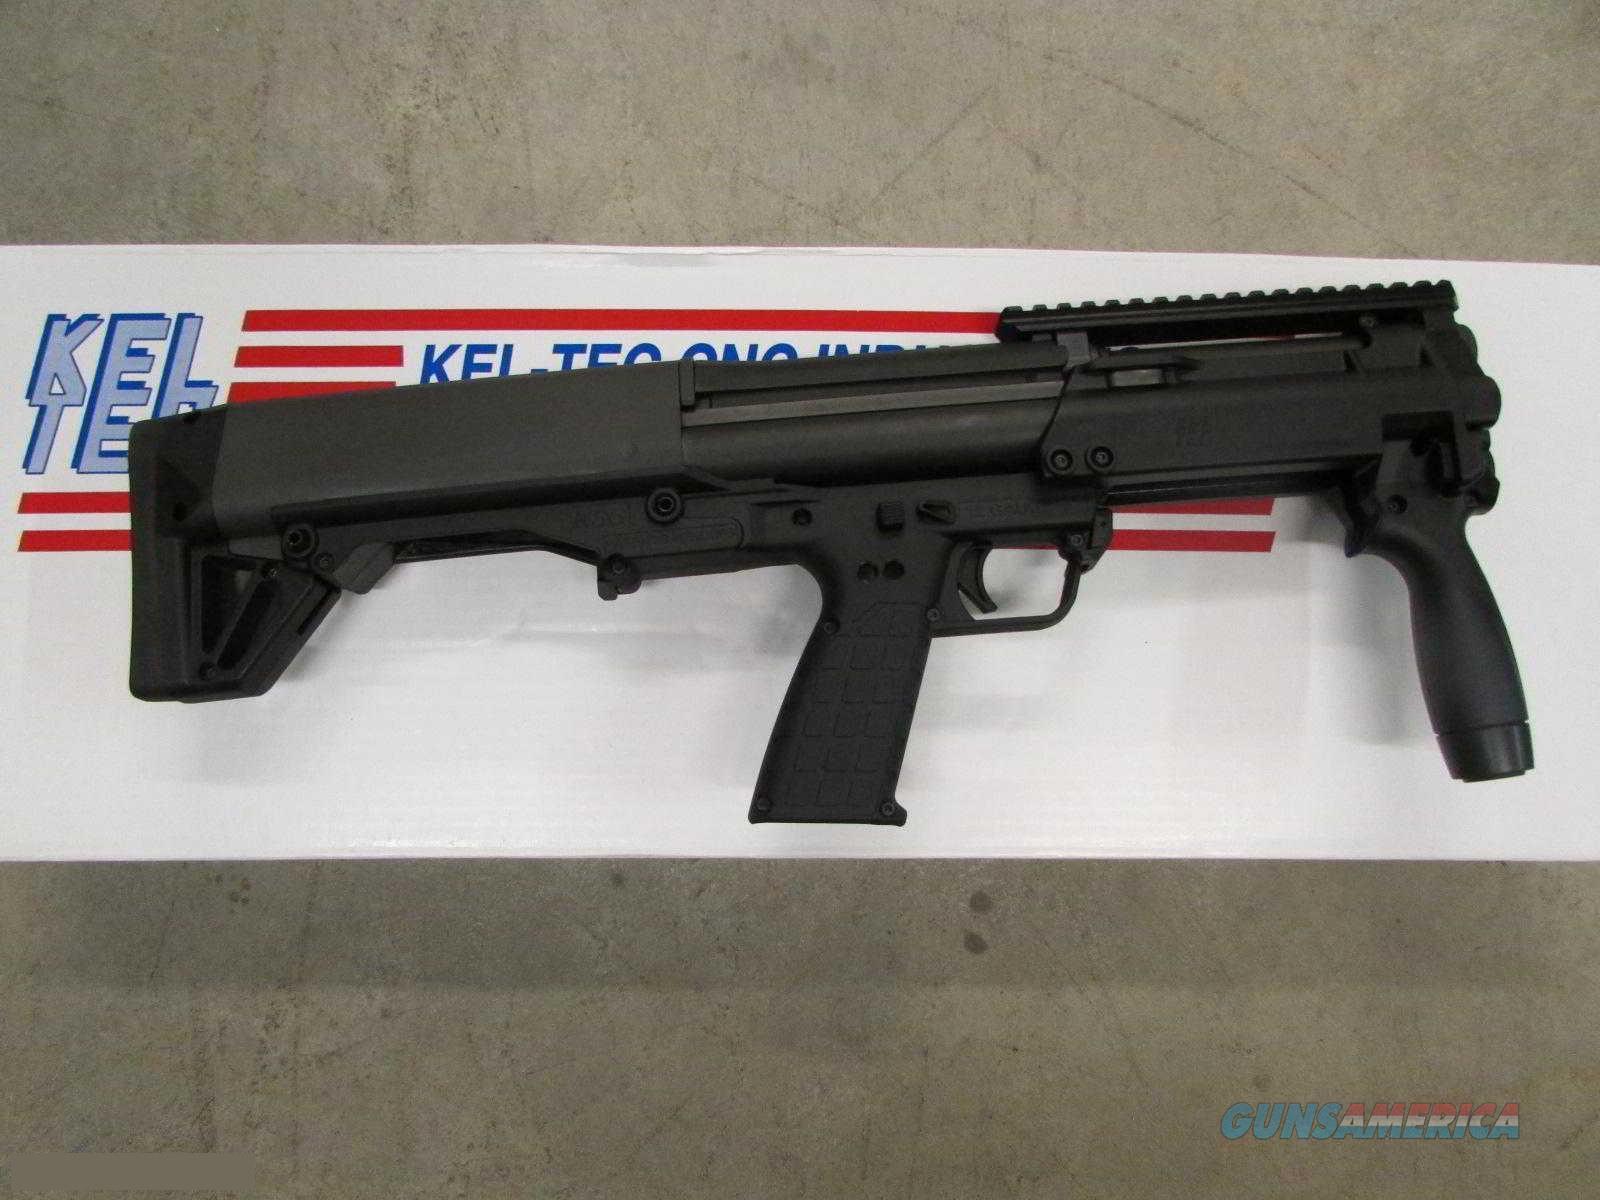 "KEL-TEC KSG TACTICAL SBS 13.7"" 12 GAUGE 10+1 CAPACITY   Guns > Shotguns > Class 3 Shotguns > Class 3 Any Other Weapon"